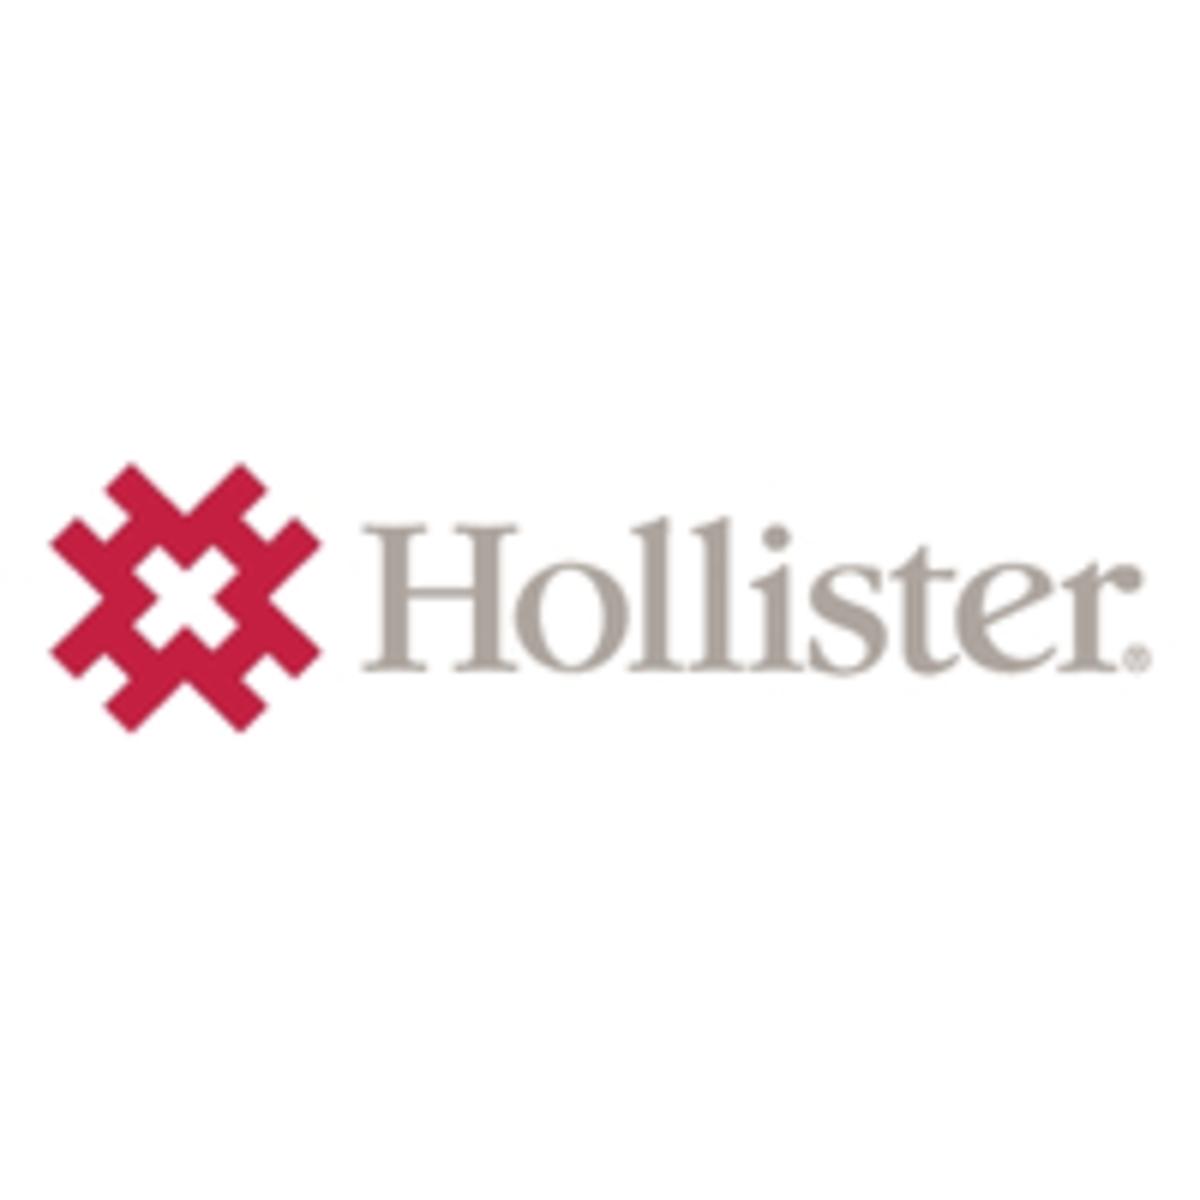 Hollister Inc logo